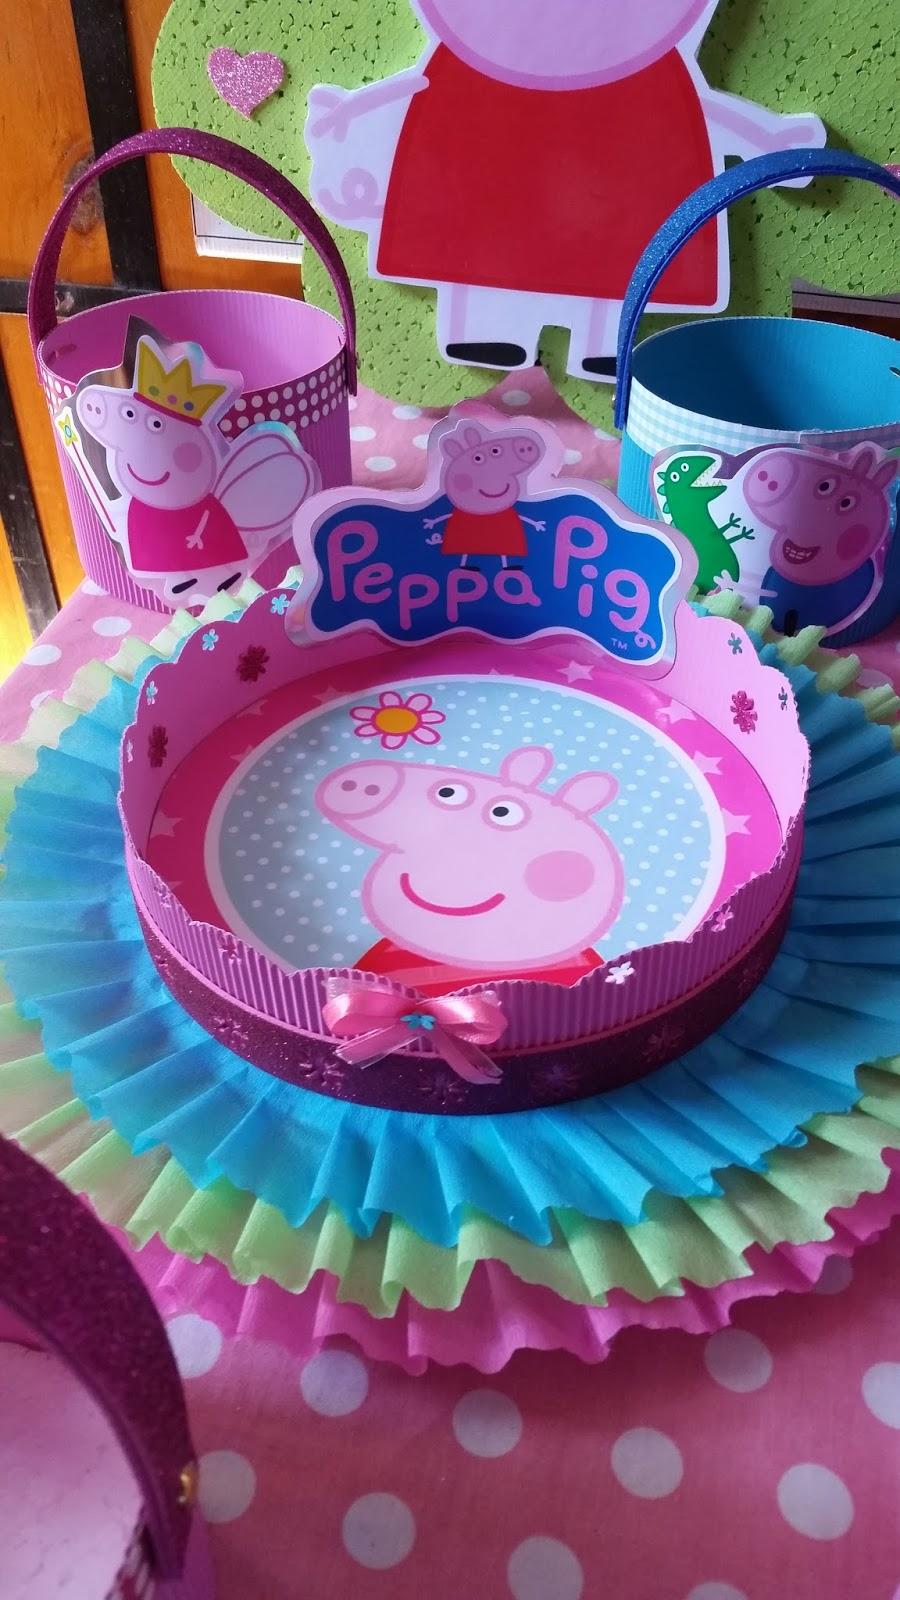 Decoraciones infantiles peppa pig - Decoracion fiesta de cumpleanos infantil ...